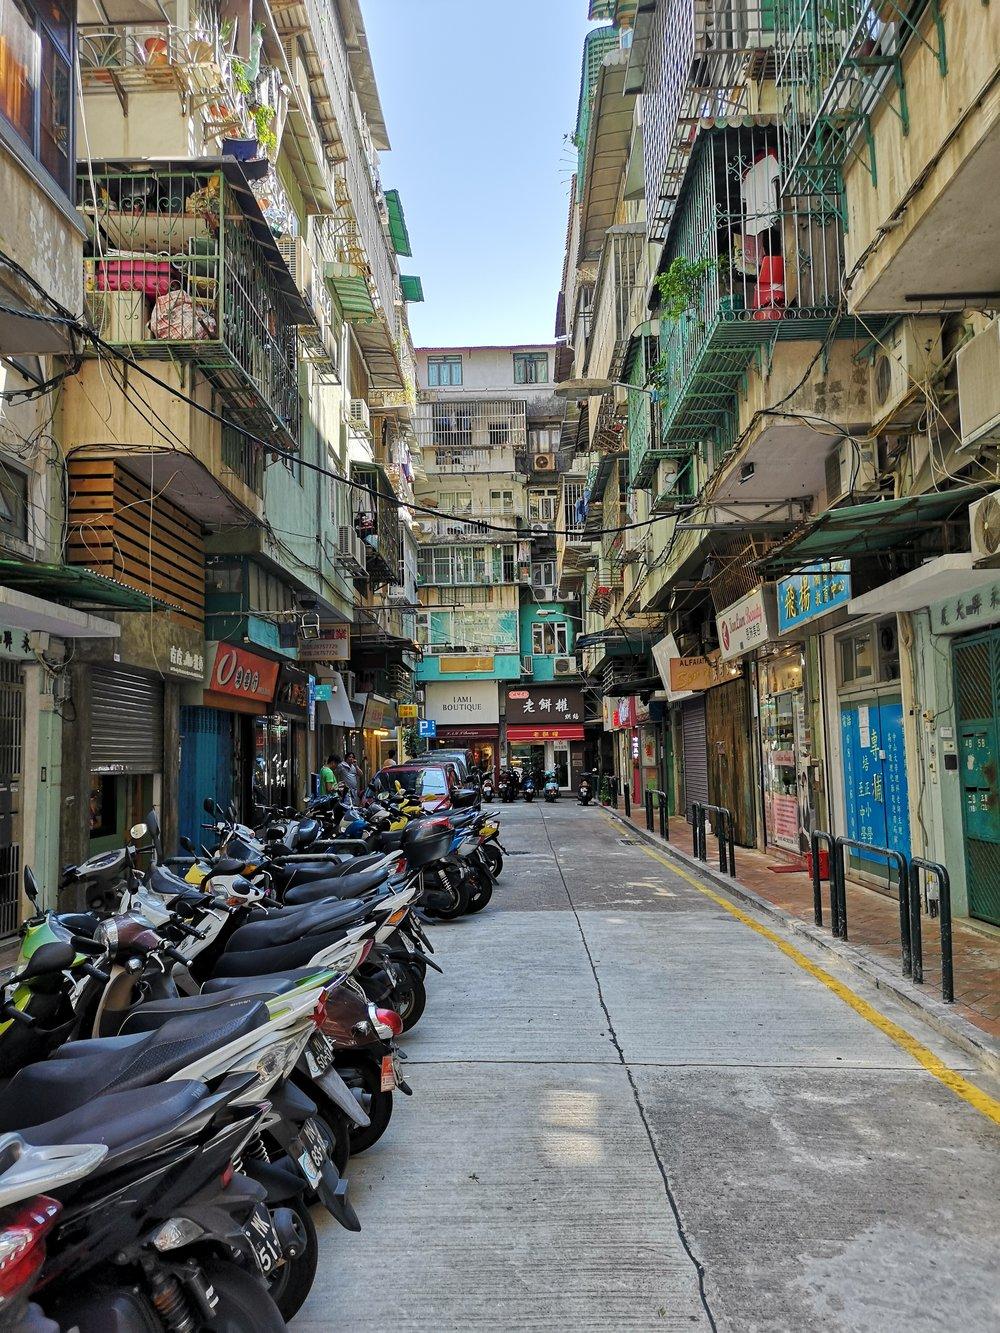 Downtown Macau, where it still feel like Macau.